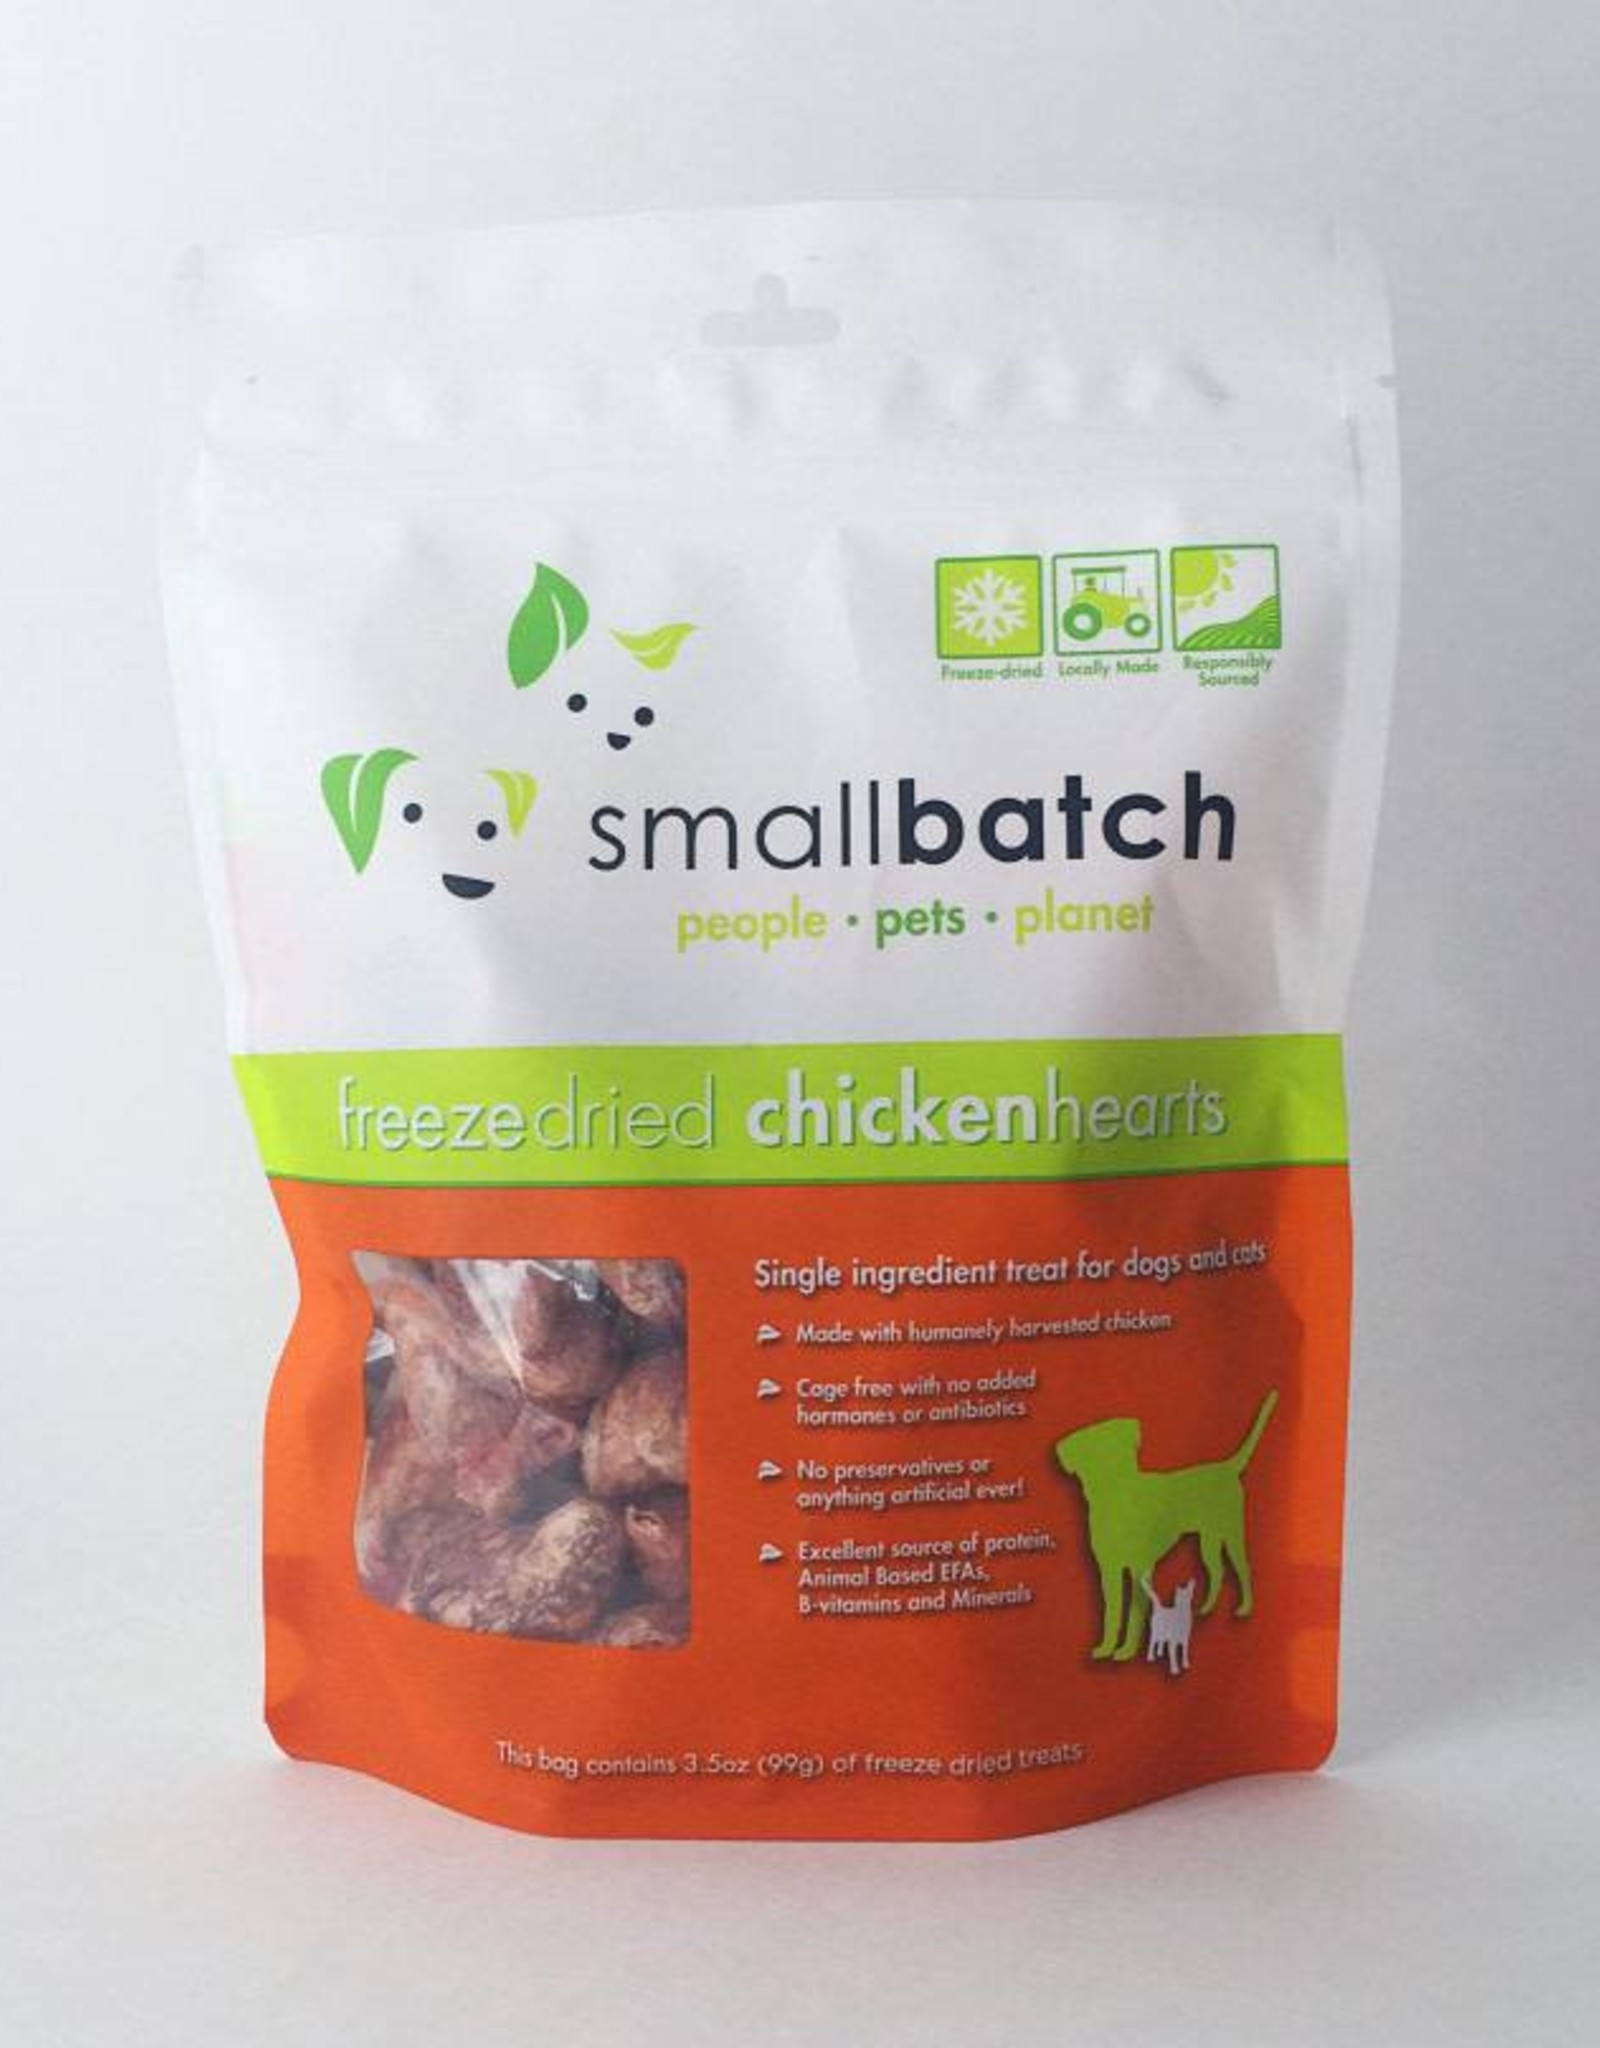 Smallbatch Smallbatch Freeze Dried Chicken Hearts